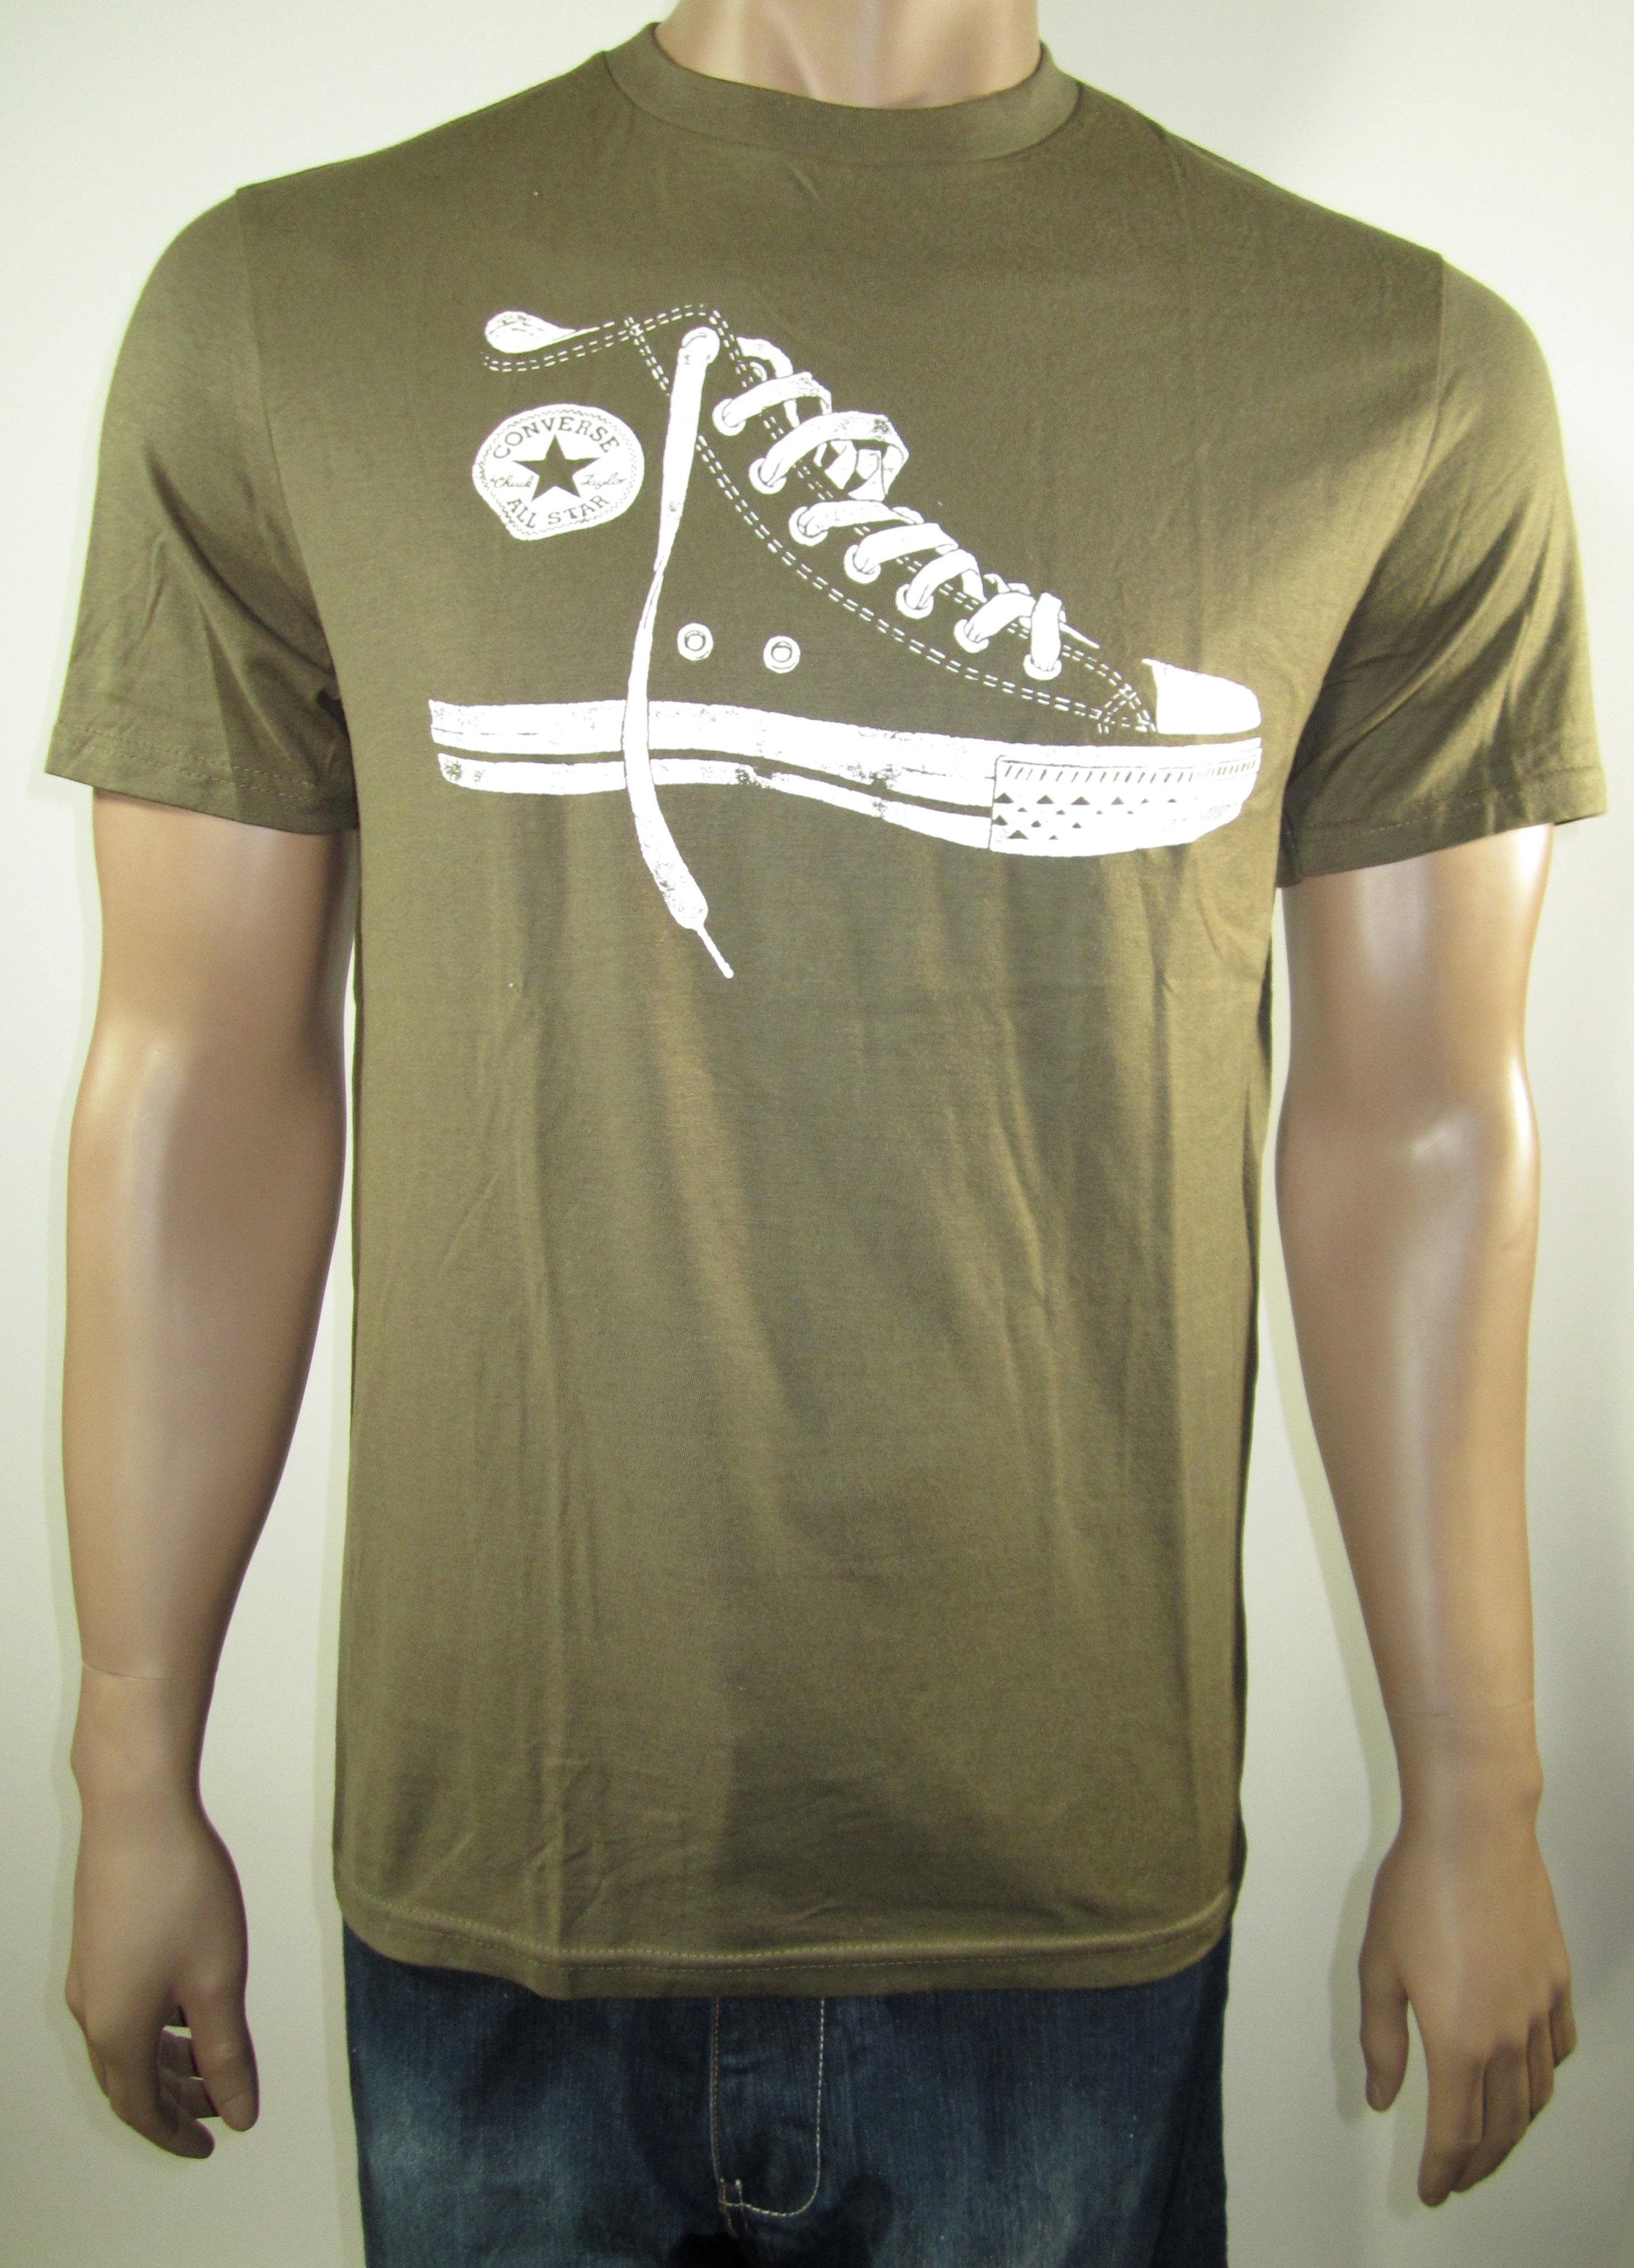 e2fec10dccd5ee Retro Converse Chuck Taylor All Star Faded T-Shirt M NWT Rare on ...